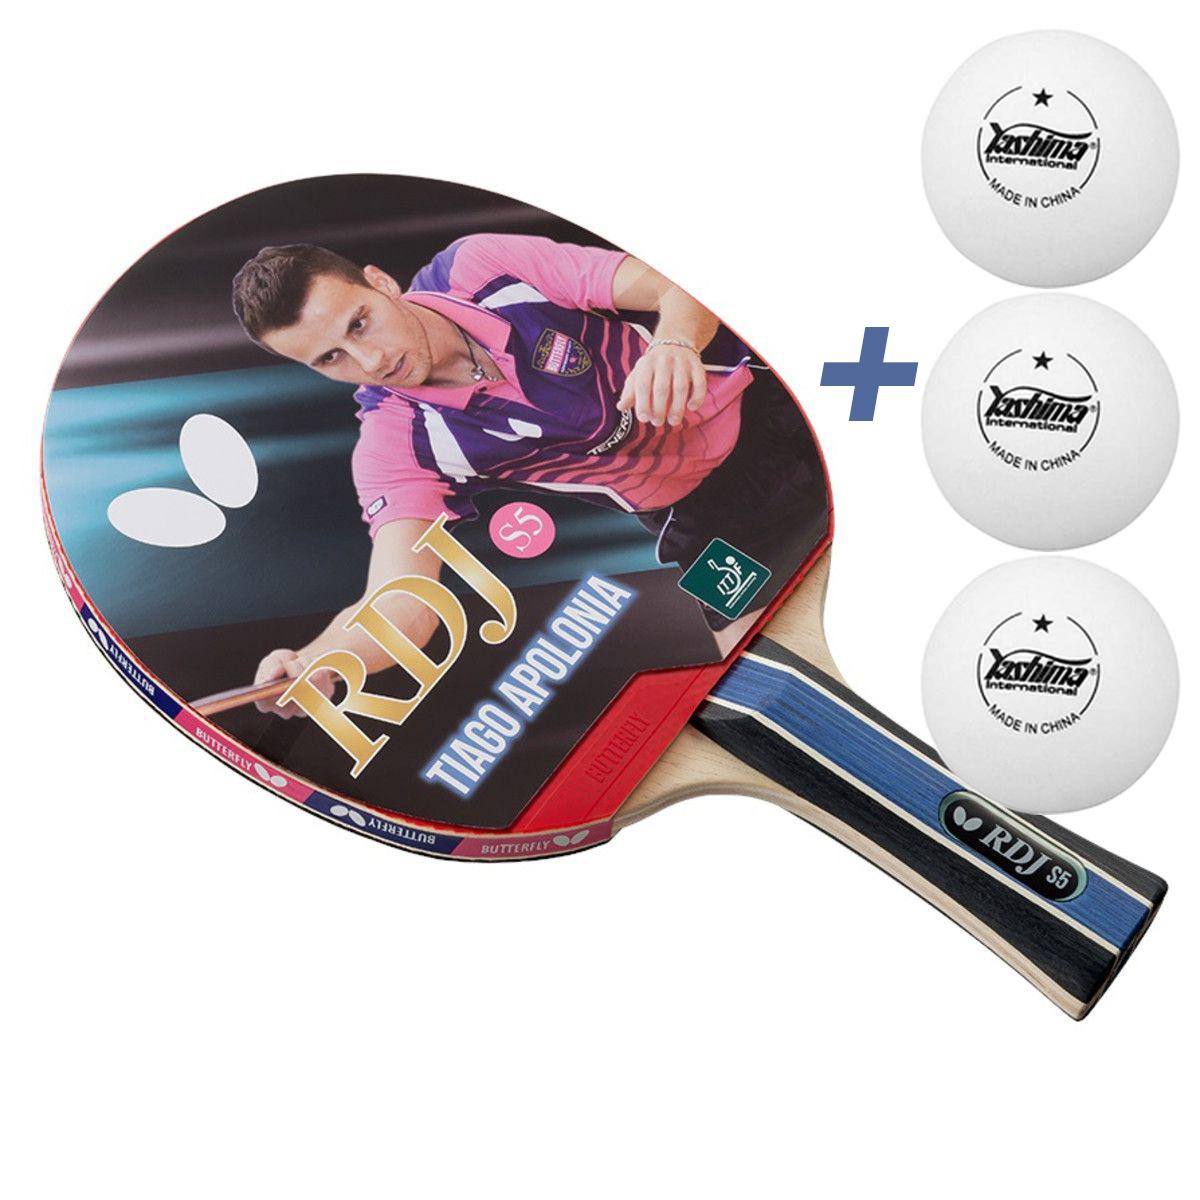 Raquete de tenis de Mesa Butterfly RDJ S5 - Tiago Apolonia + Brinde 3 Bolinhas  - REAL ESPORTE